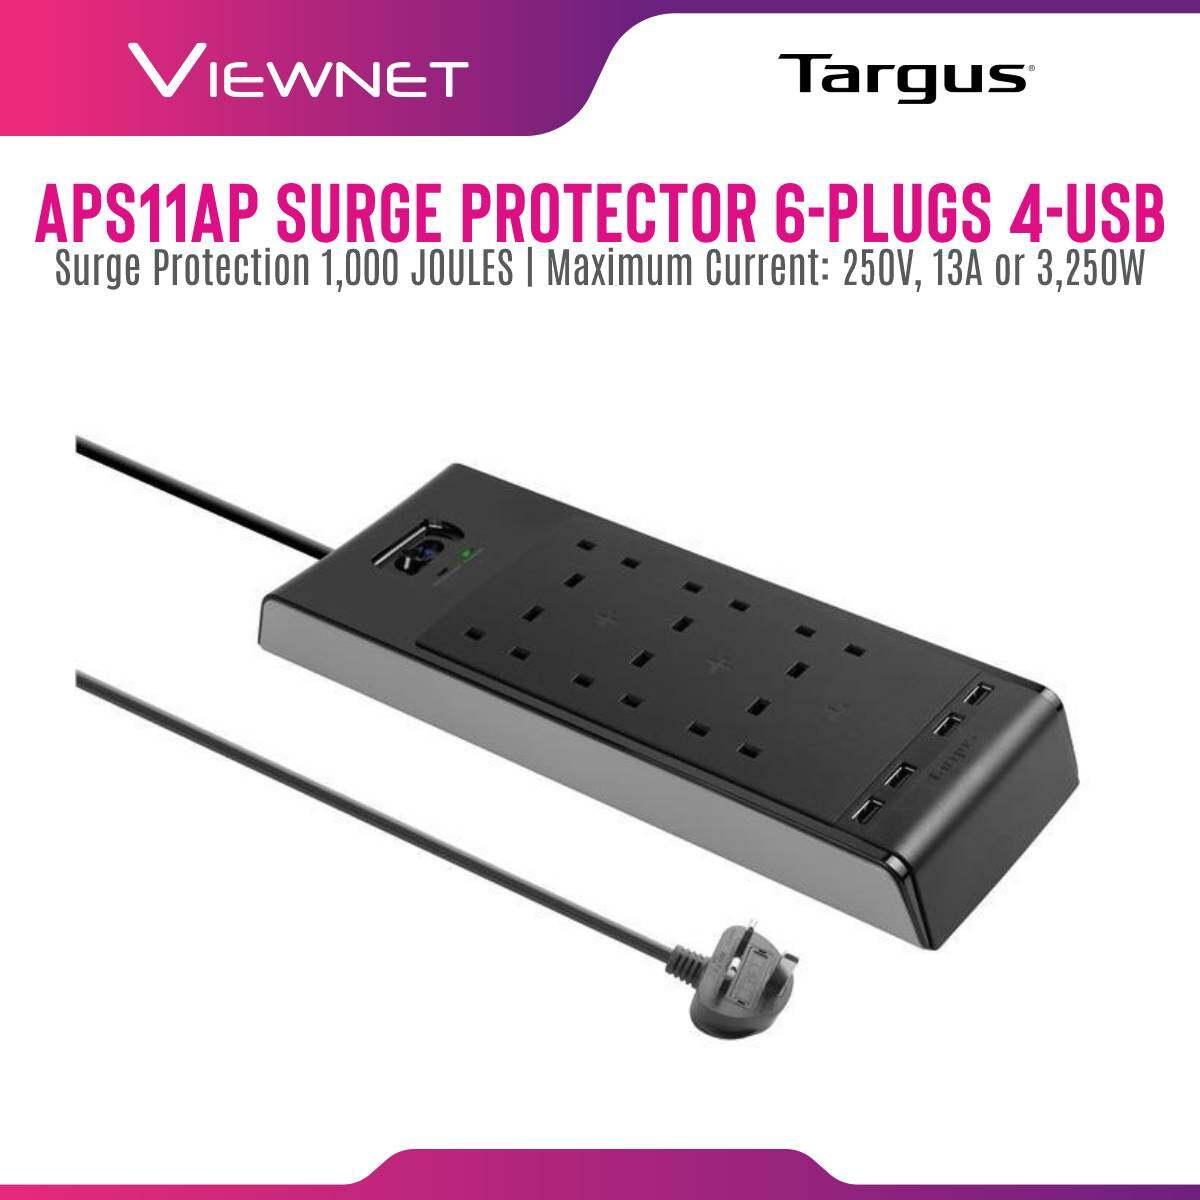 TARGUS SURGE PROTECTOR 6-PLUGS WITH 4-USB 2M (APS11AP-50)